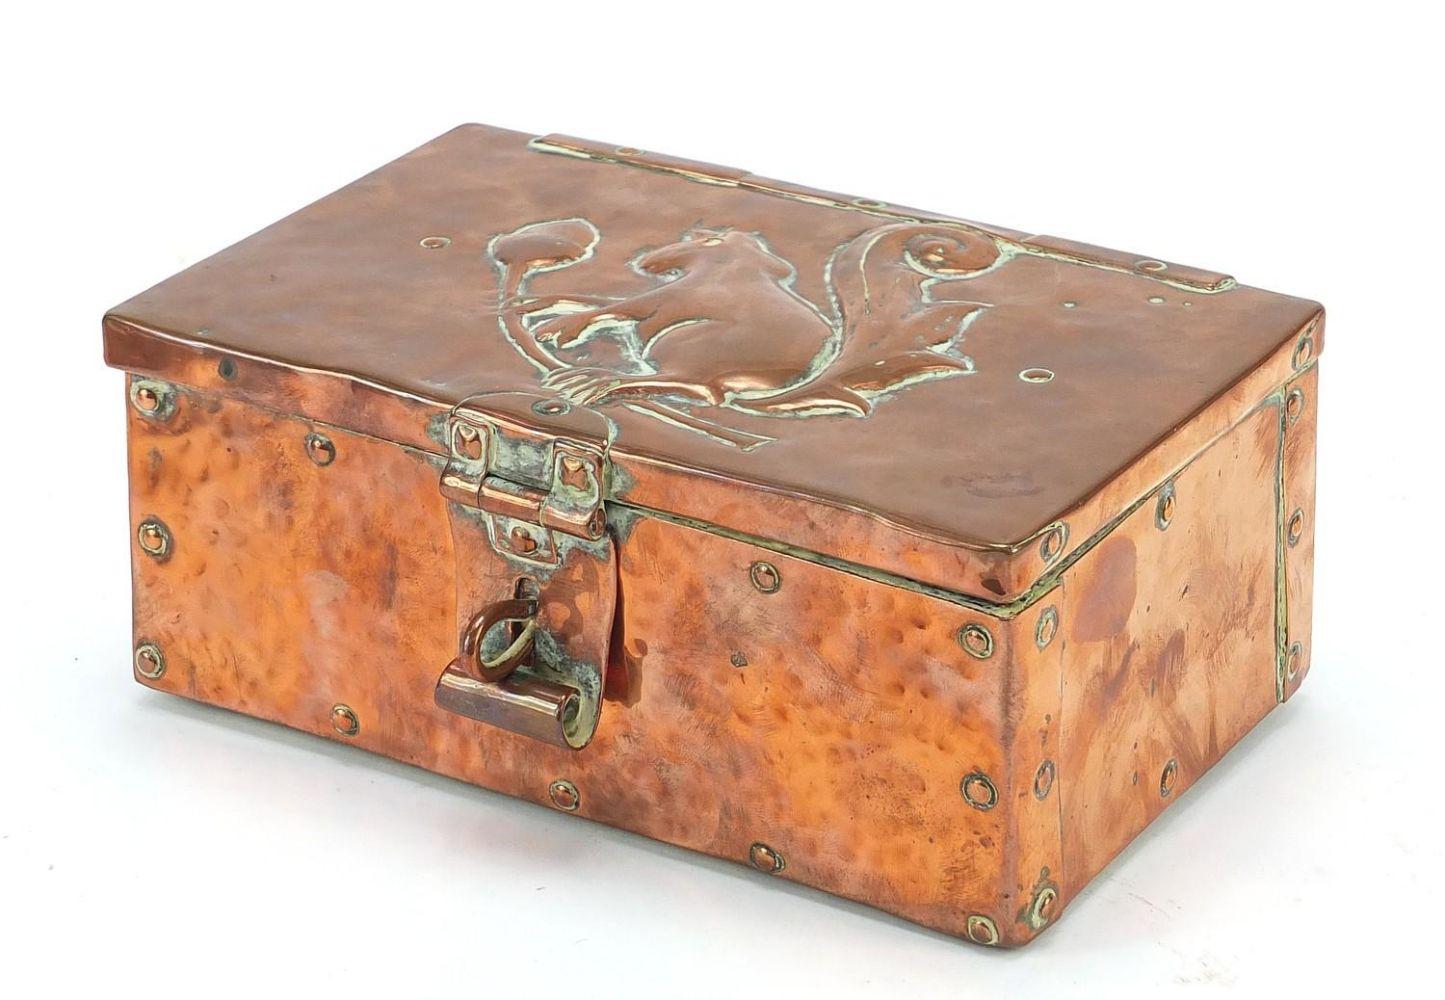 Fine Art, Antiques, Collectables, Decorative, & General Items